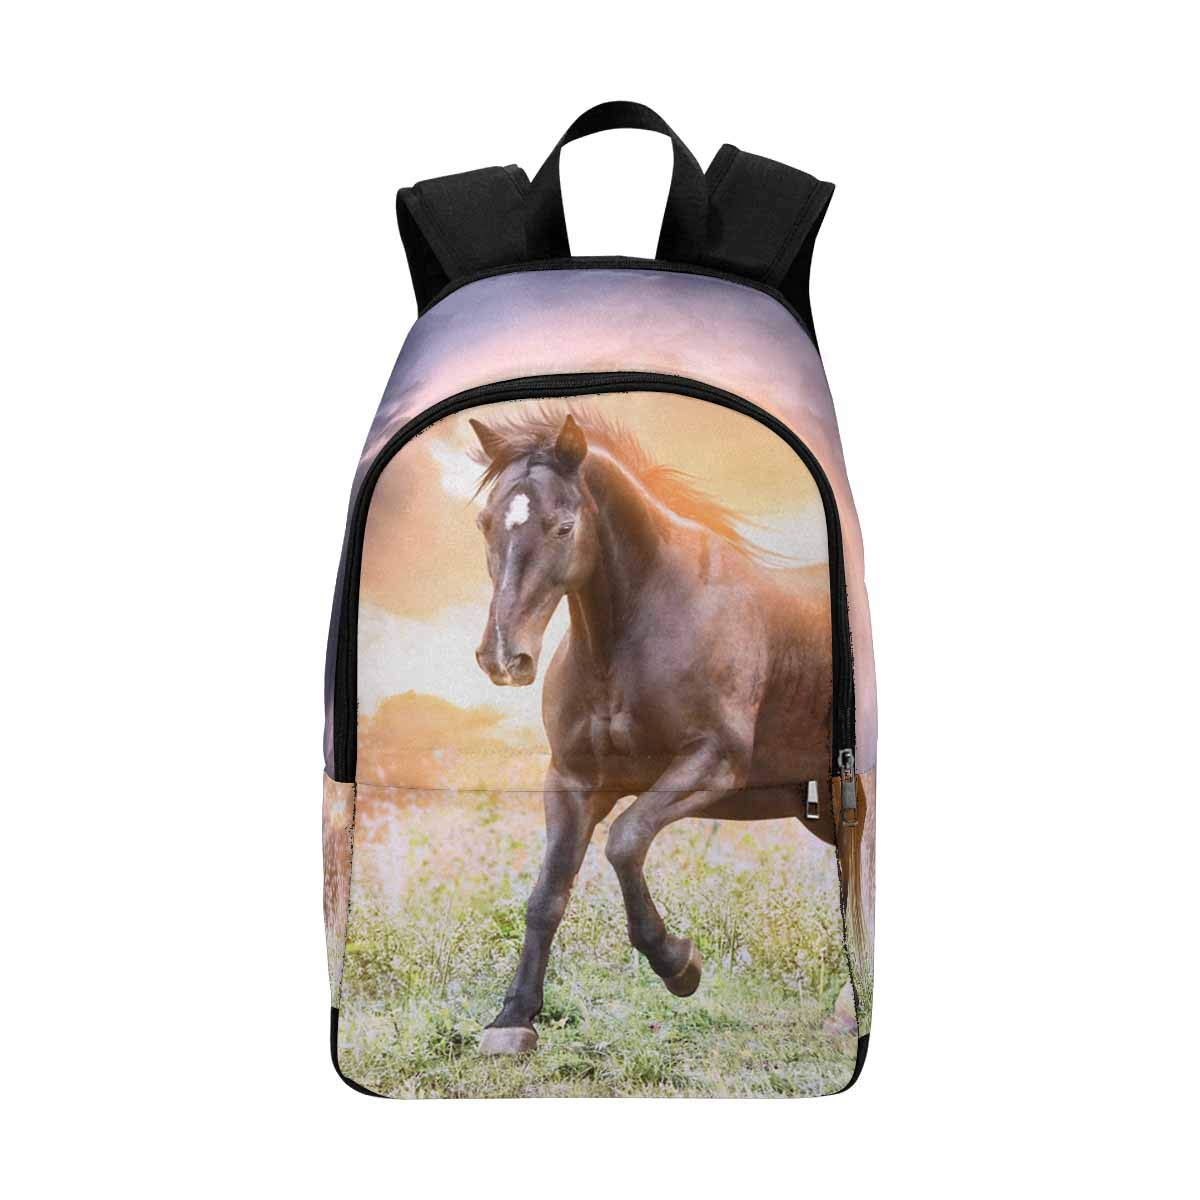 InterestPrint APPAREL ボーイズ US サイズ: backpack   B07GB59JMQ